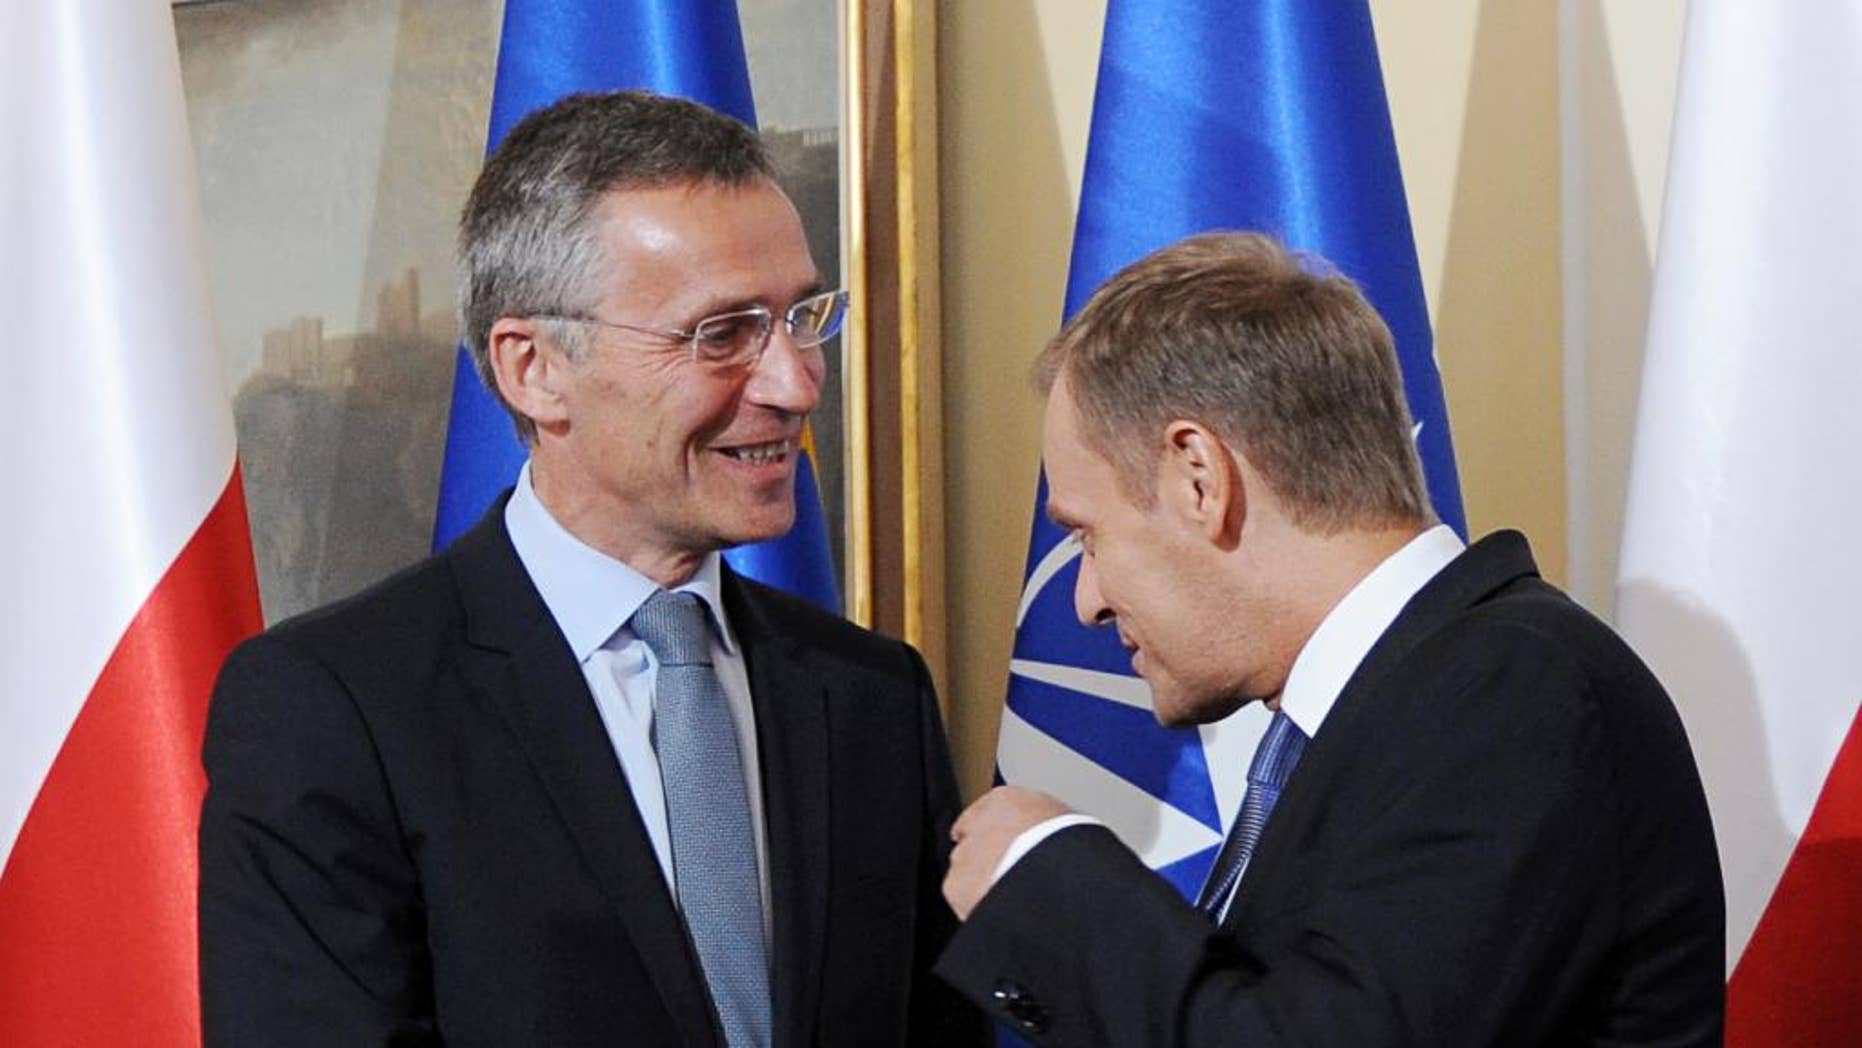 Polish Prime Minister Donald Tusk, right, gestures, as he meets NATO Secretary General designate Jens Stoltenberg, prior to talks in Warsaw, Poland, Wednesday, June 25, 2014. (AP Photo/Alik Keplicz)